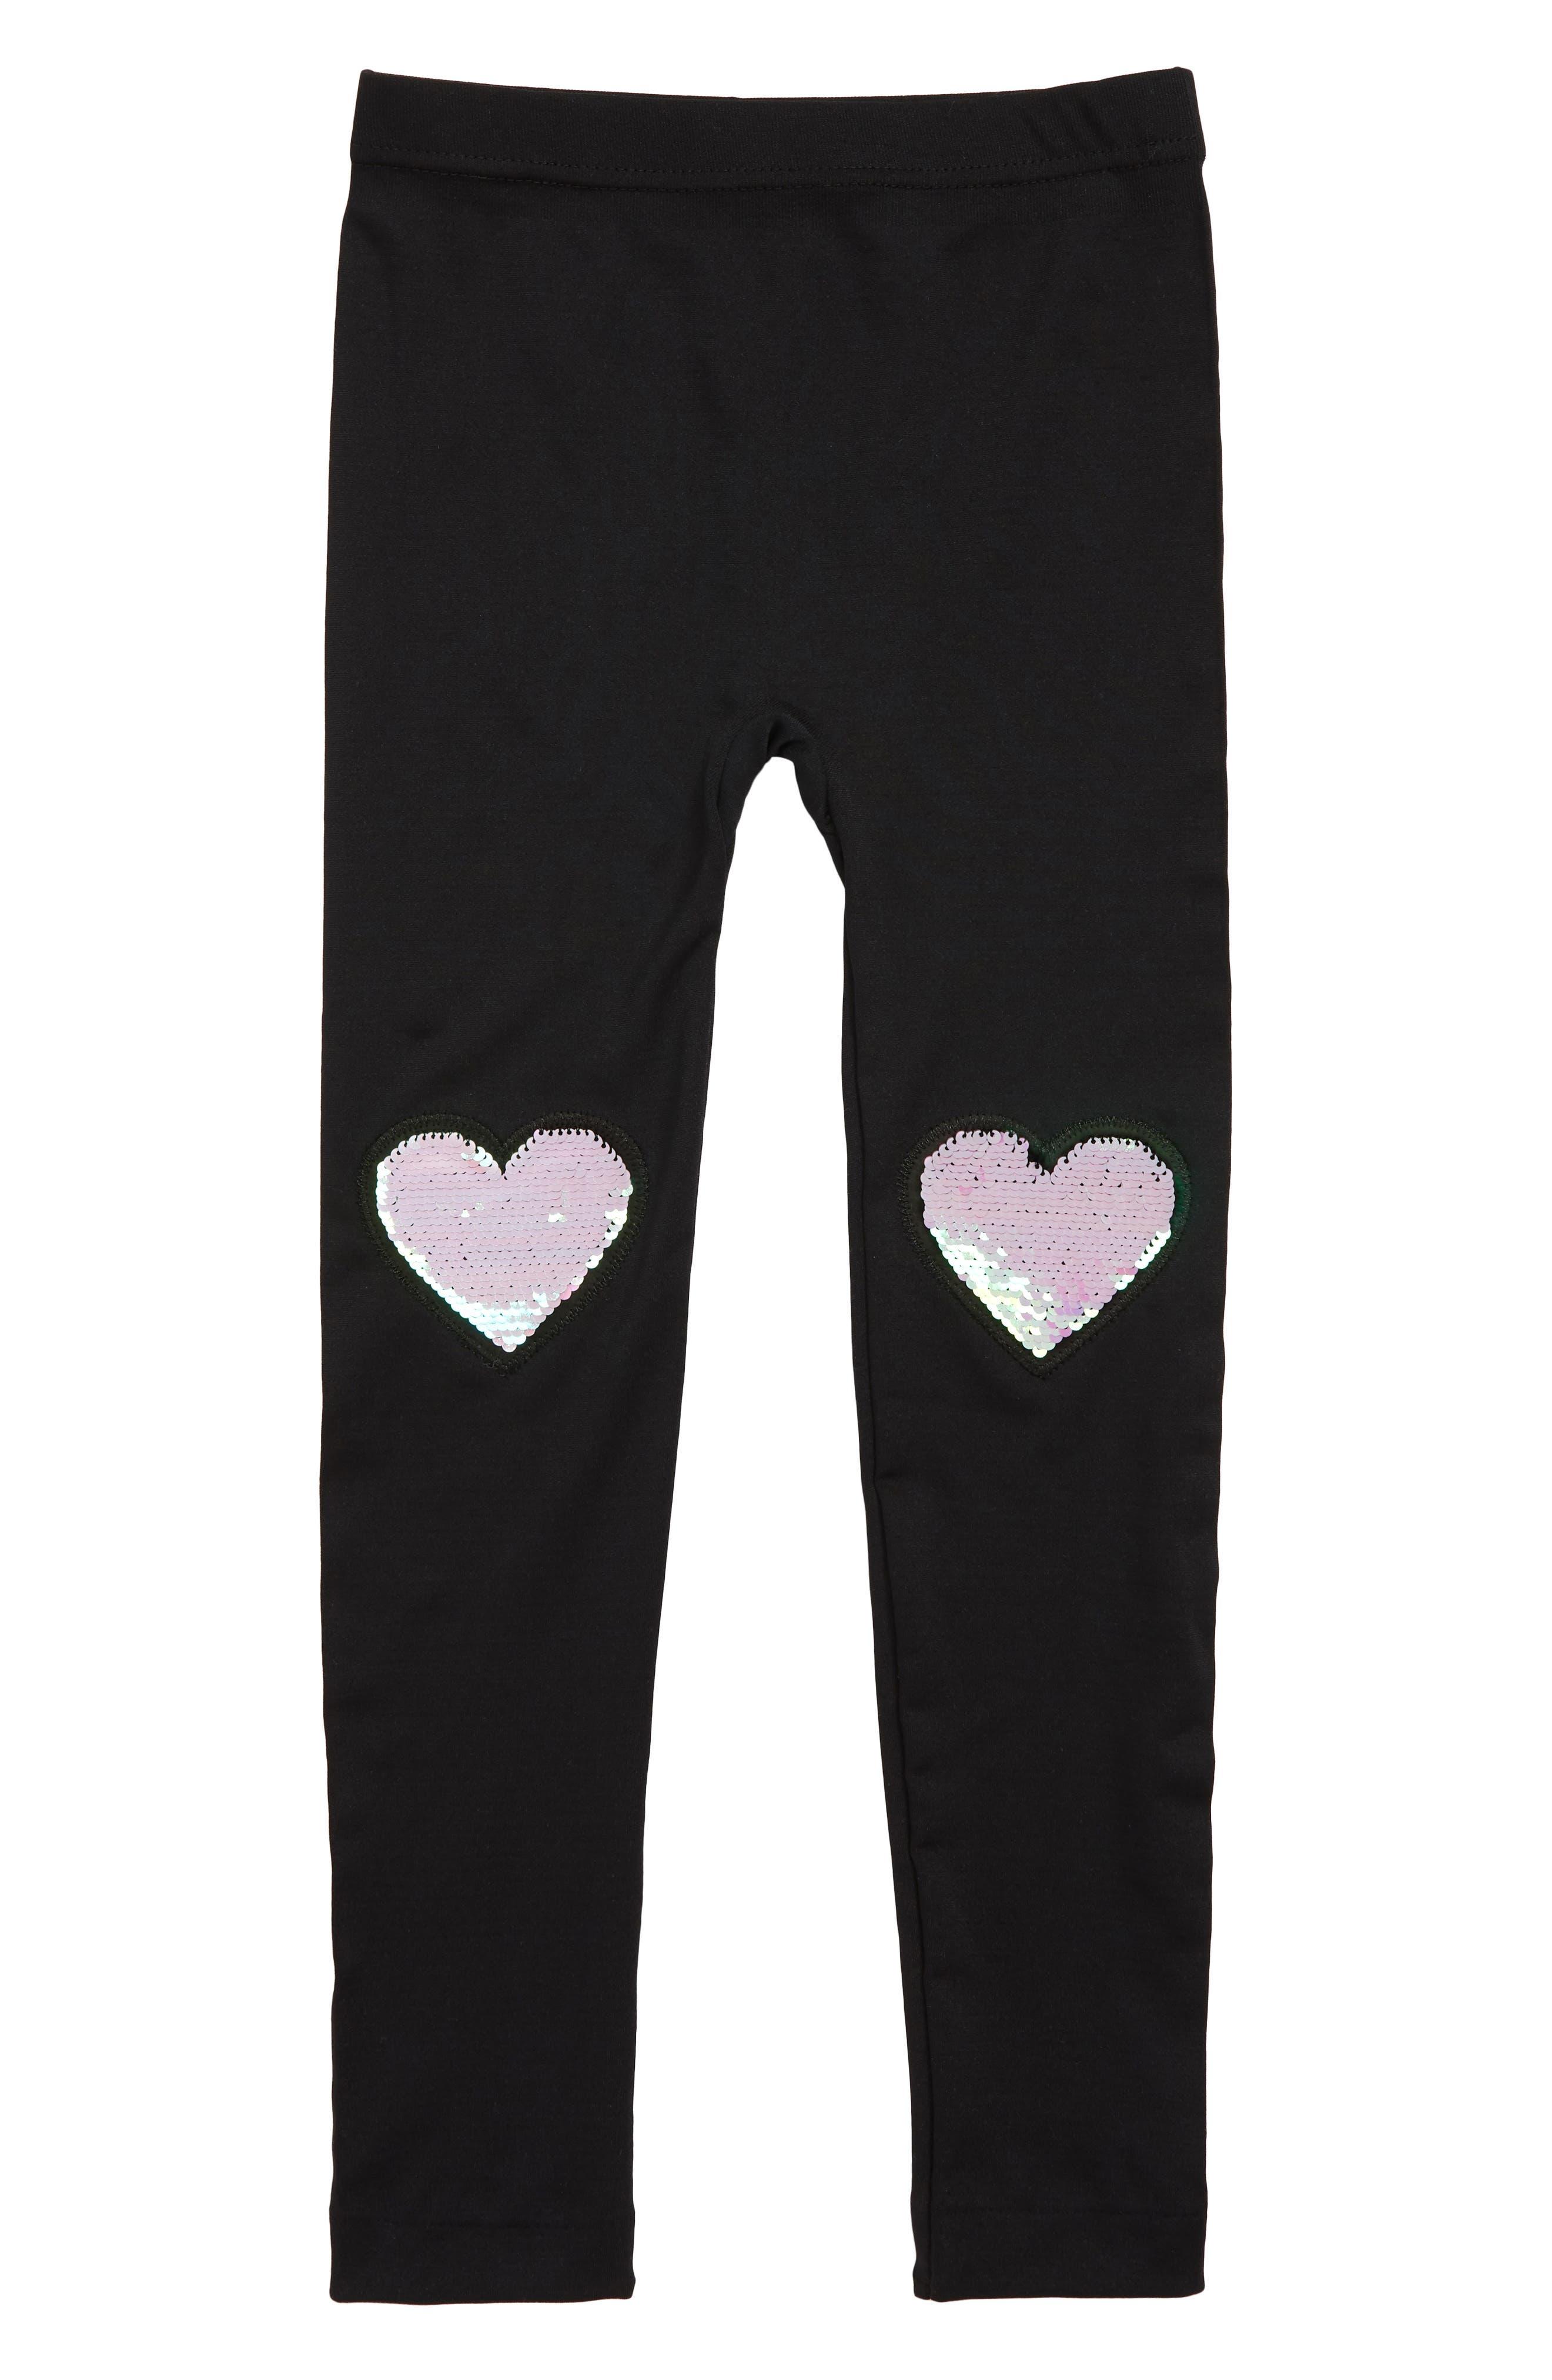 Girls Capelli New York Hearts Reversible Sequin Leggings Size XSS (46)  Black